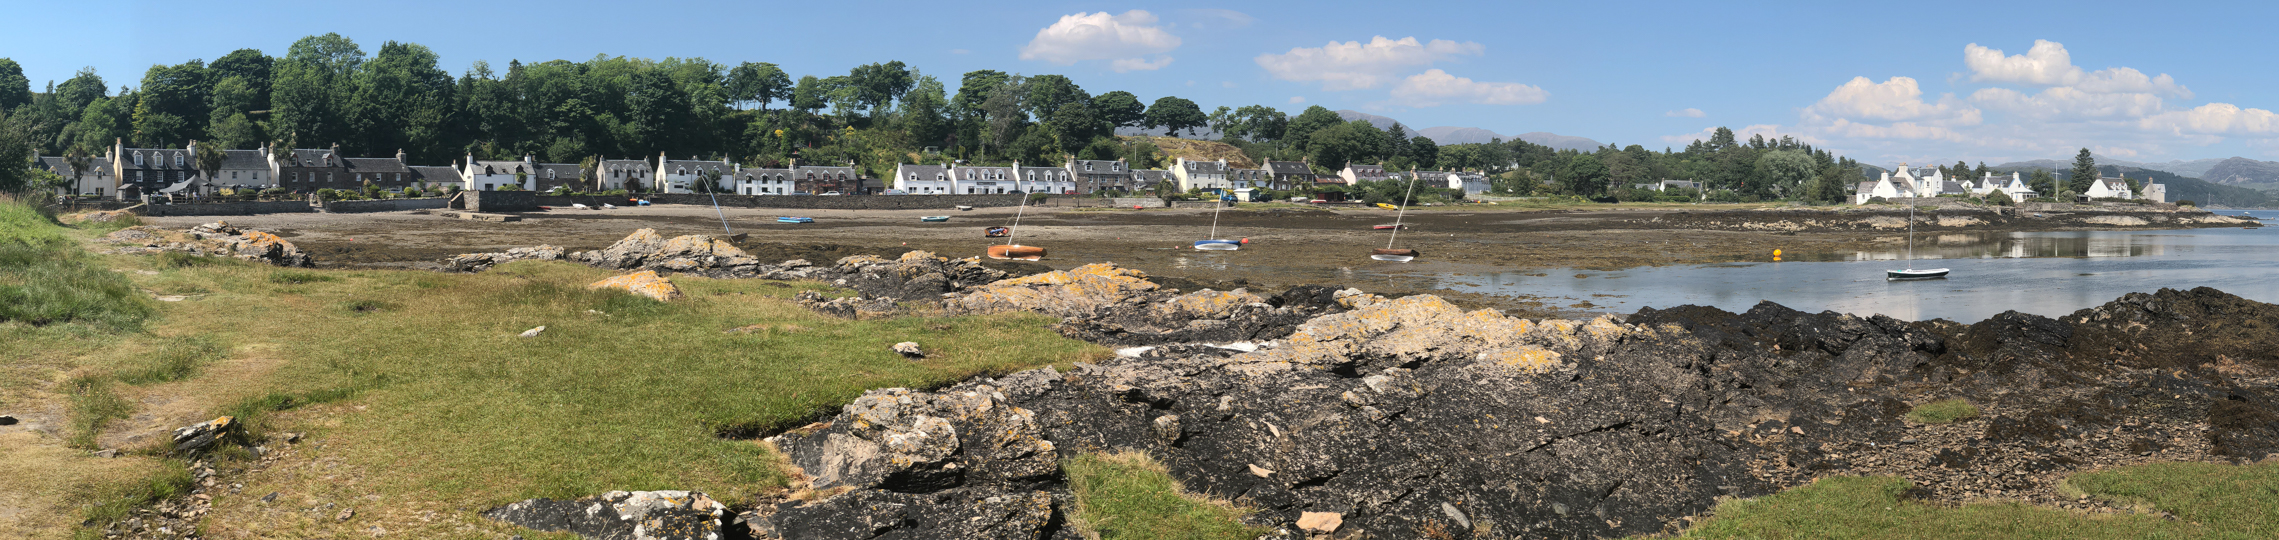 Scotland: The Torridon